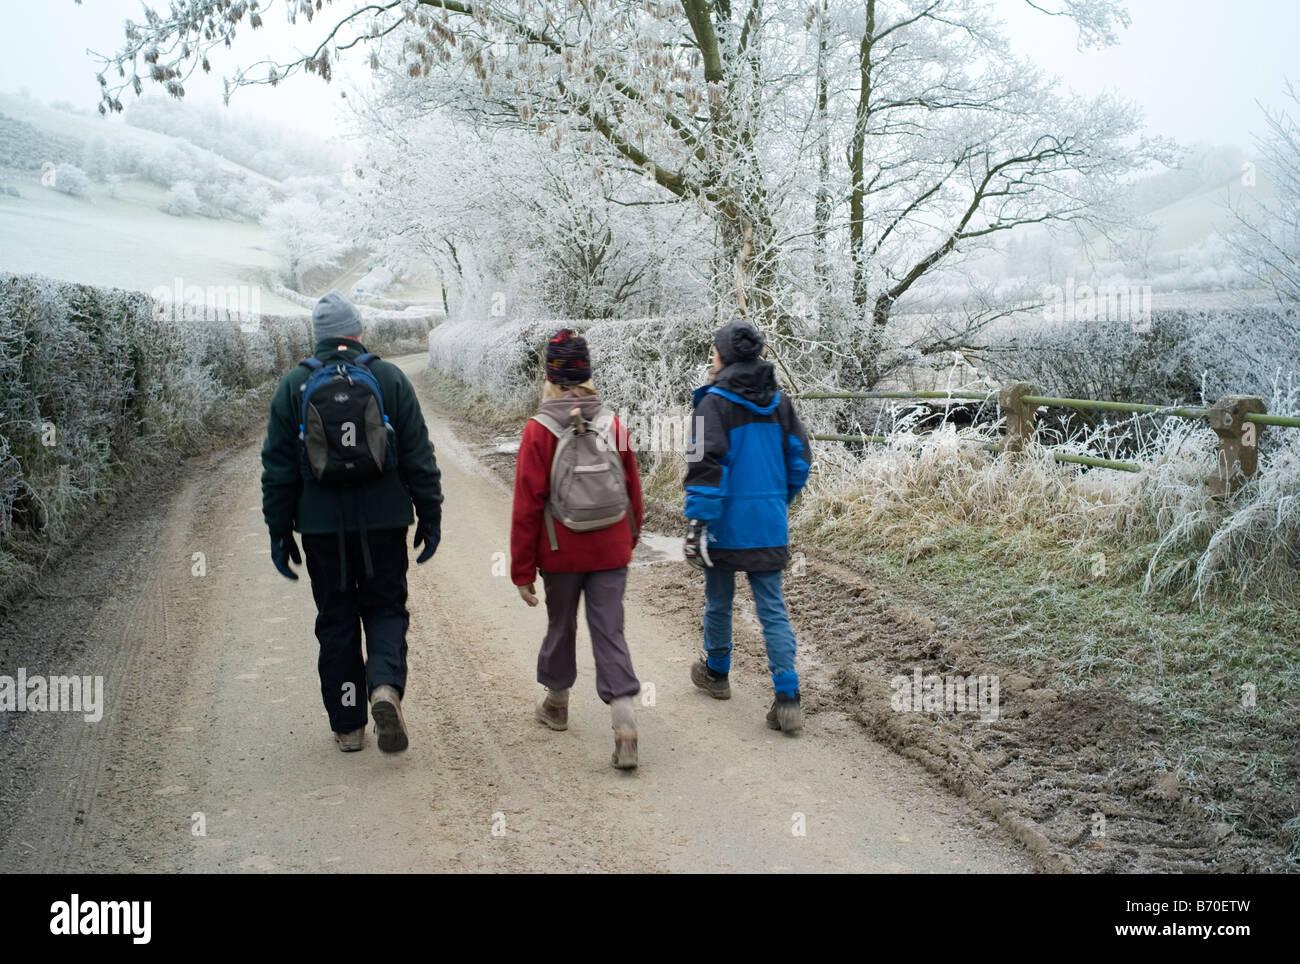 Winter walk UK Stock Photo: 21524633 - Alamy